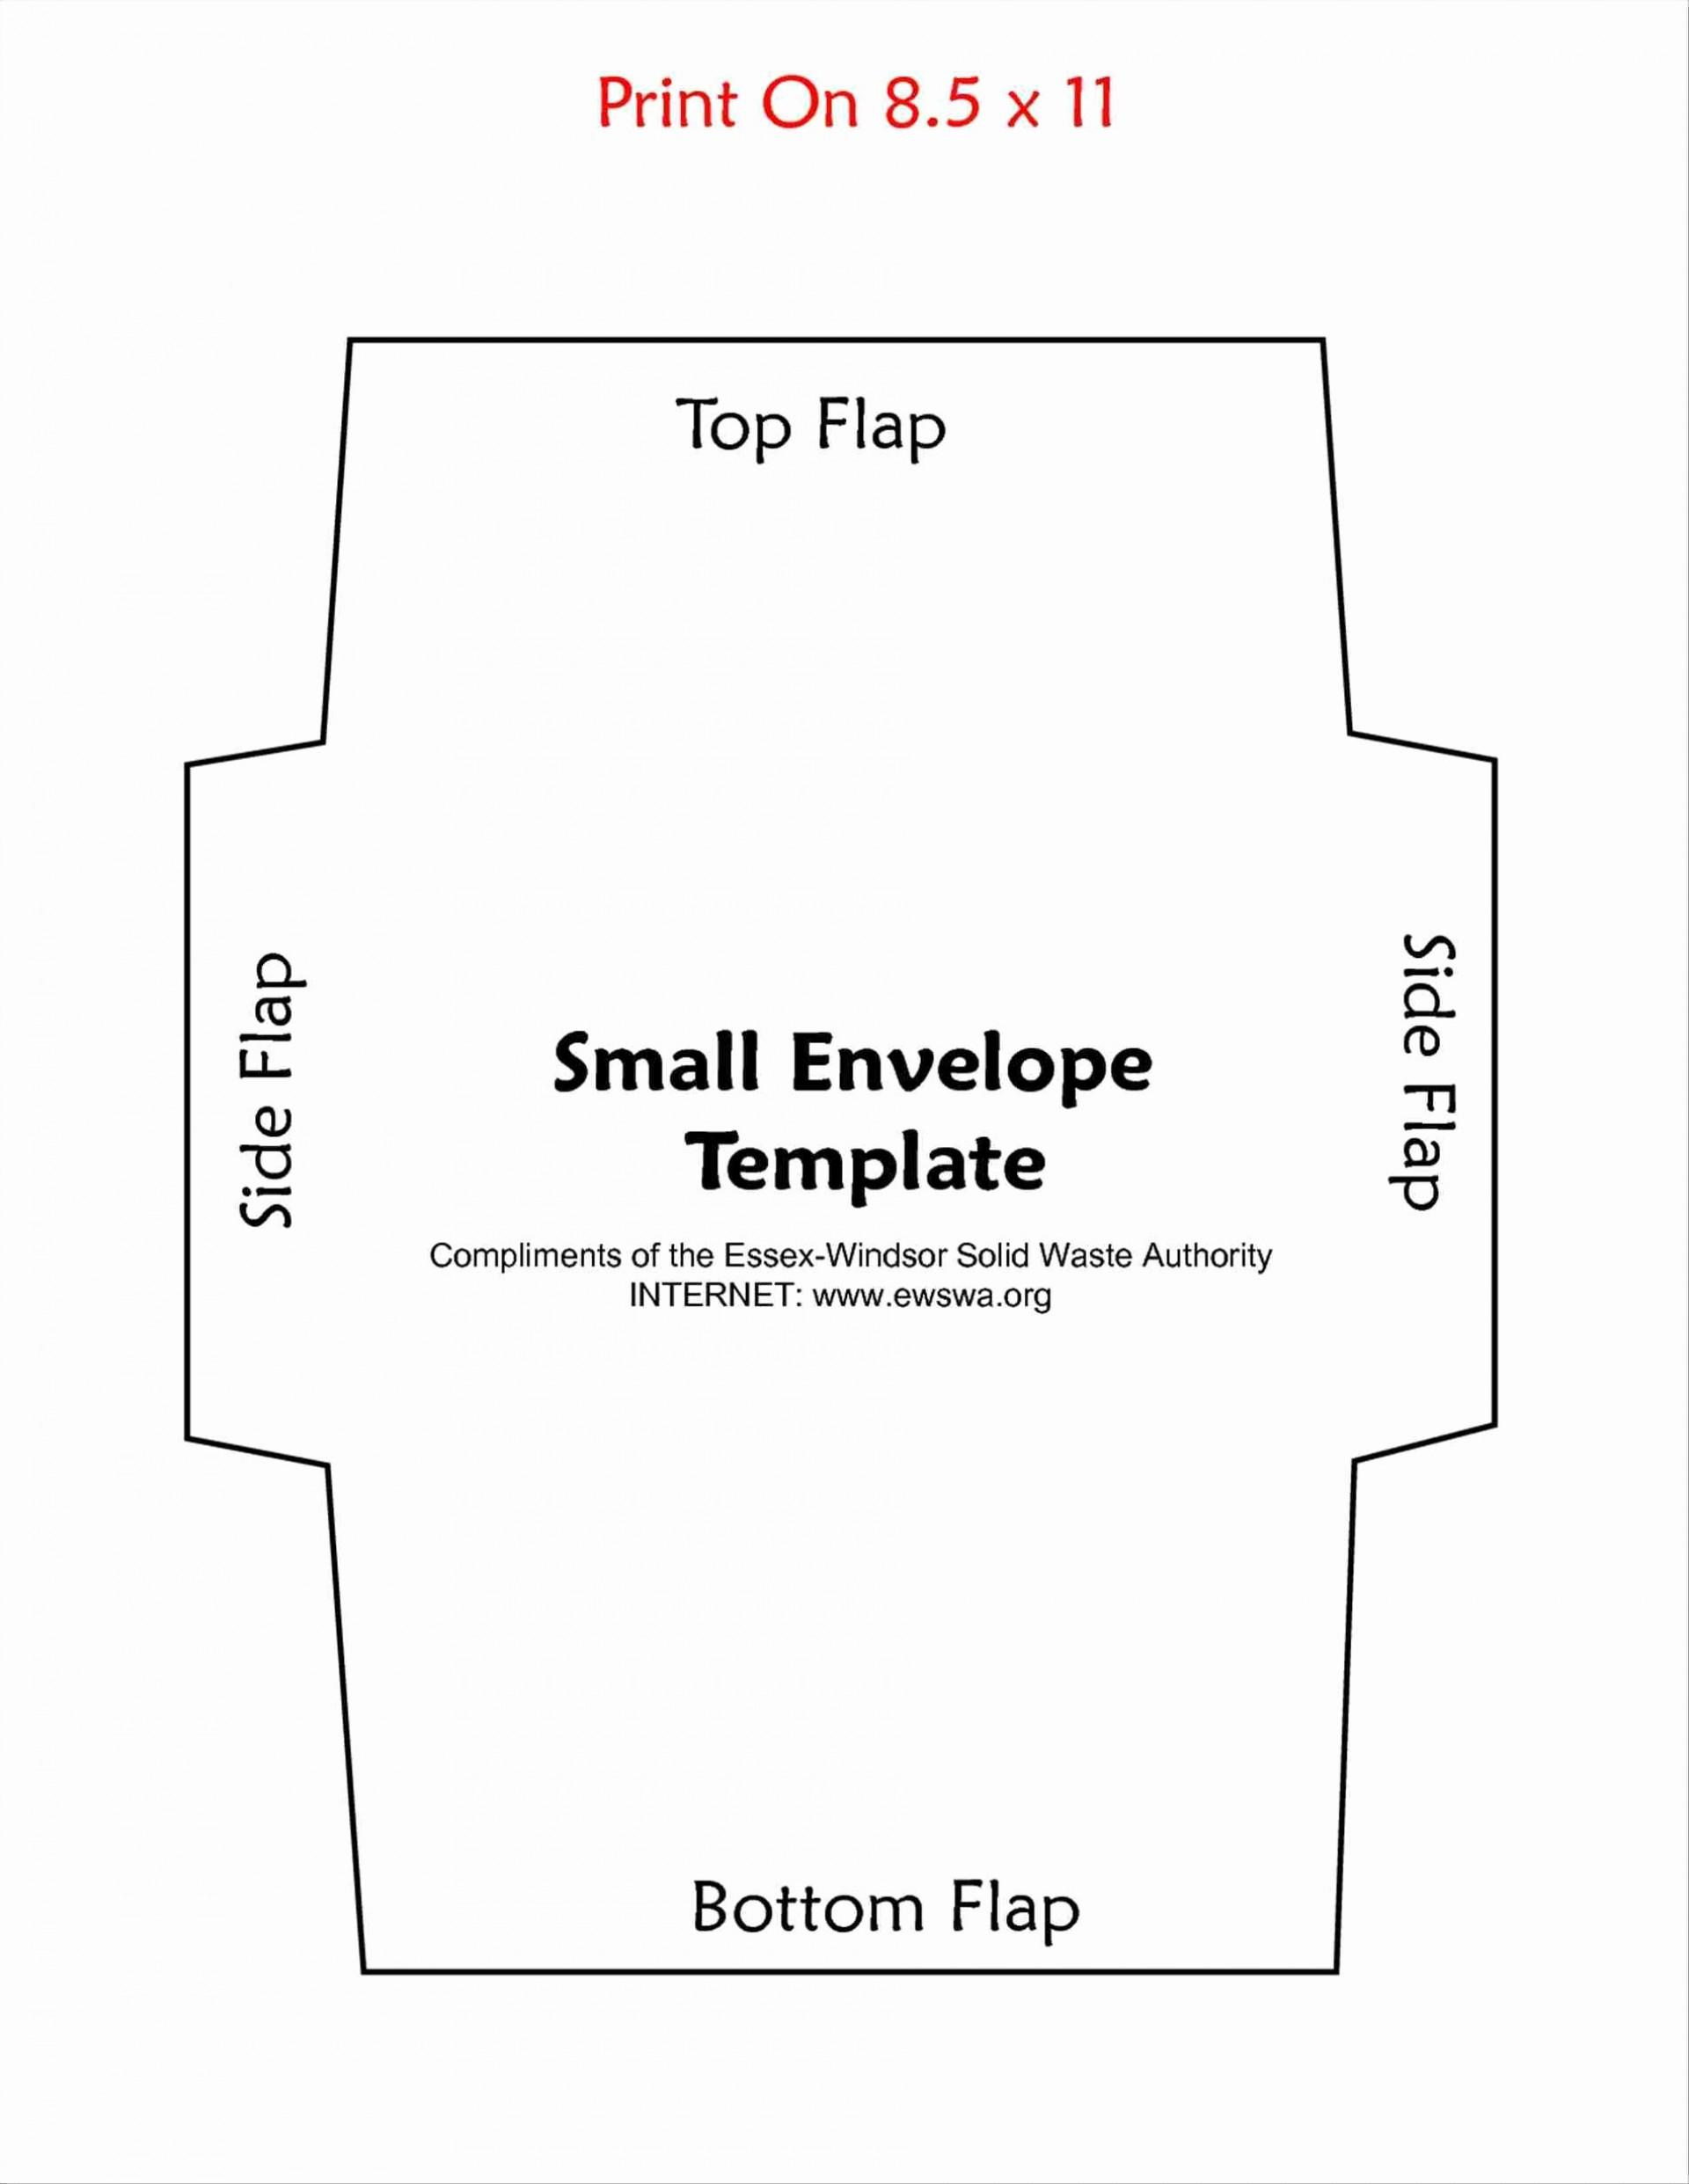 006 Printable Gift Card Envelope Template Lovely Templates Small Of - Free Printable Gift Card Envelope Template